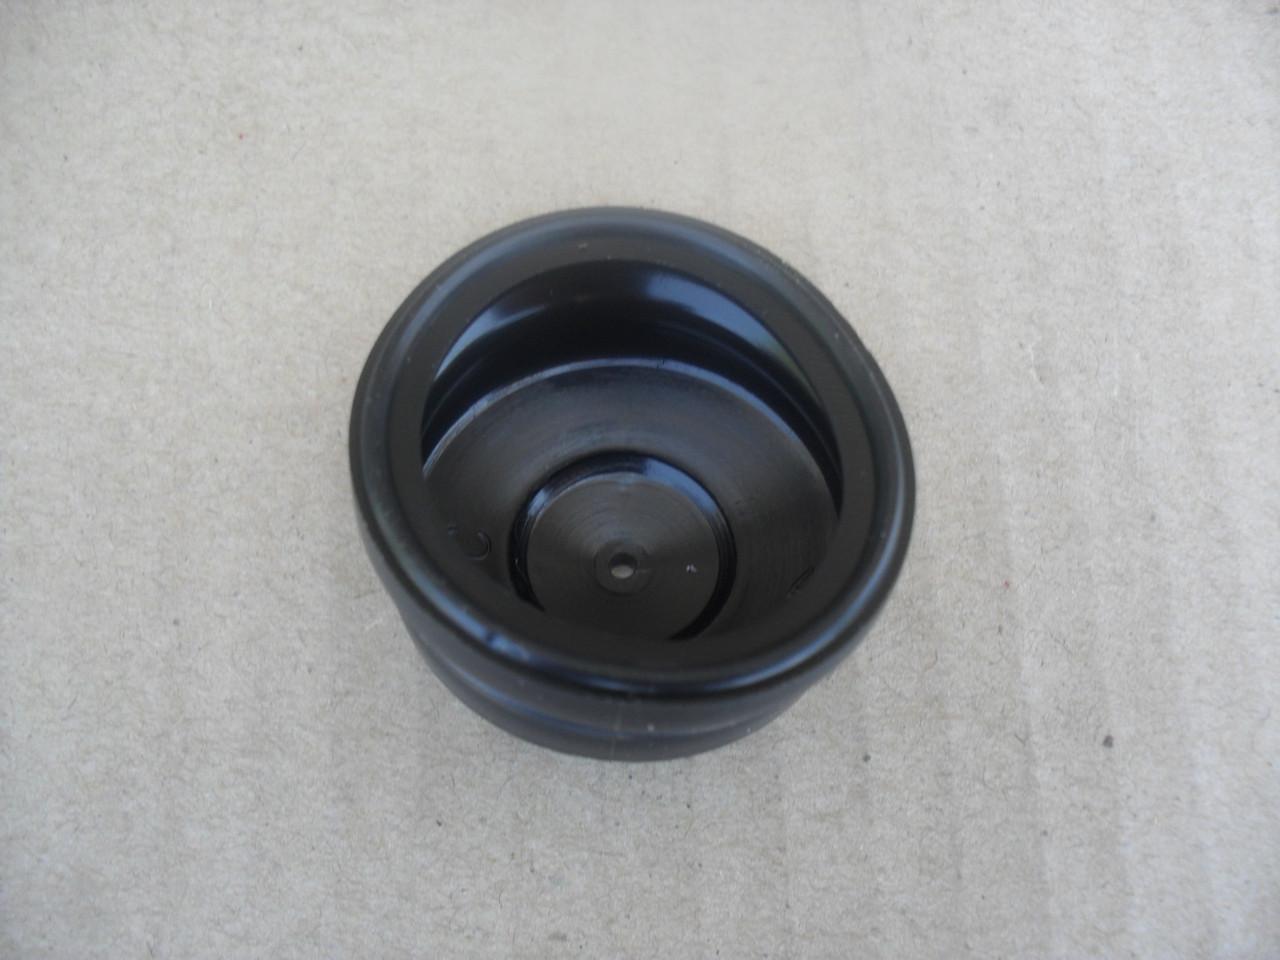 Engine Carburetor Blower Primer Bulb for 2000 Toro CCR 3600 Snow Thrower 38439